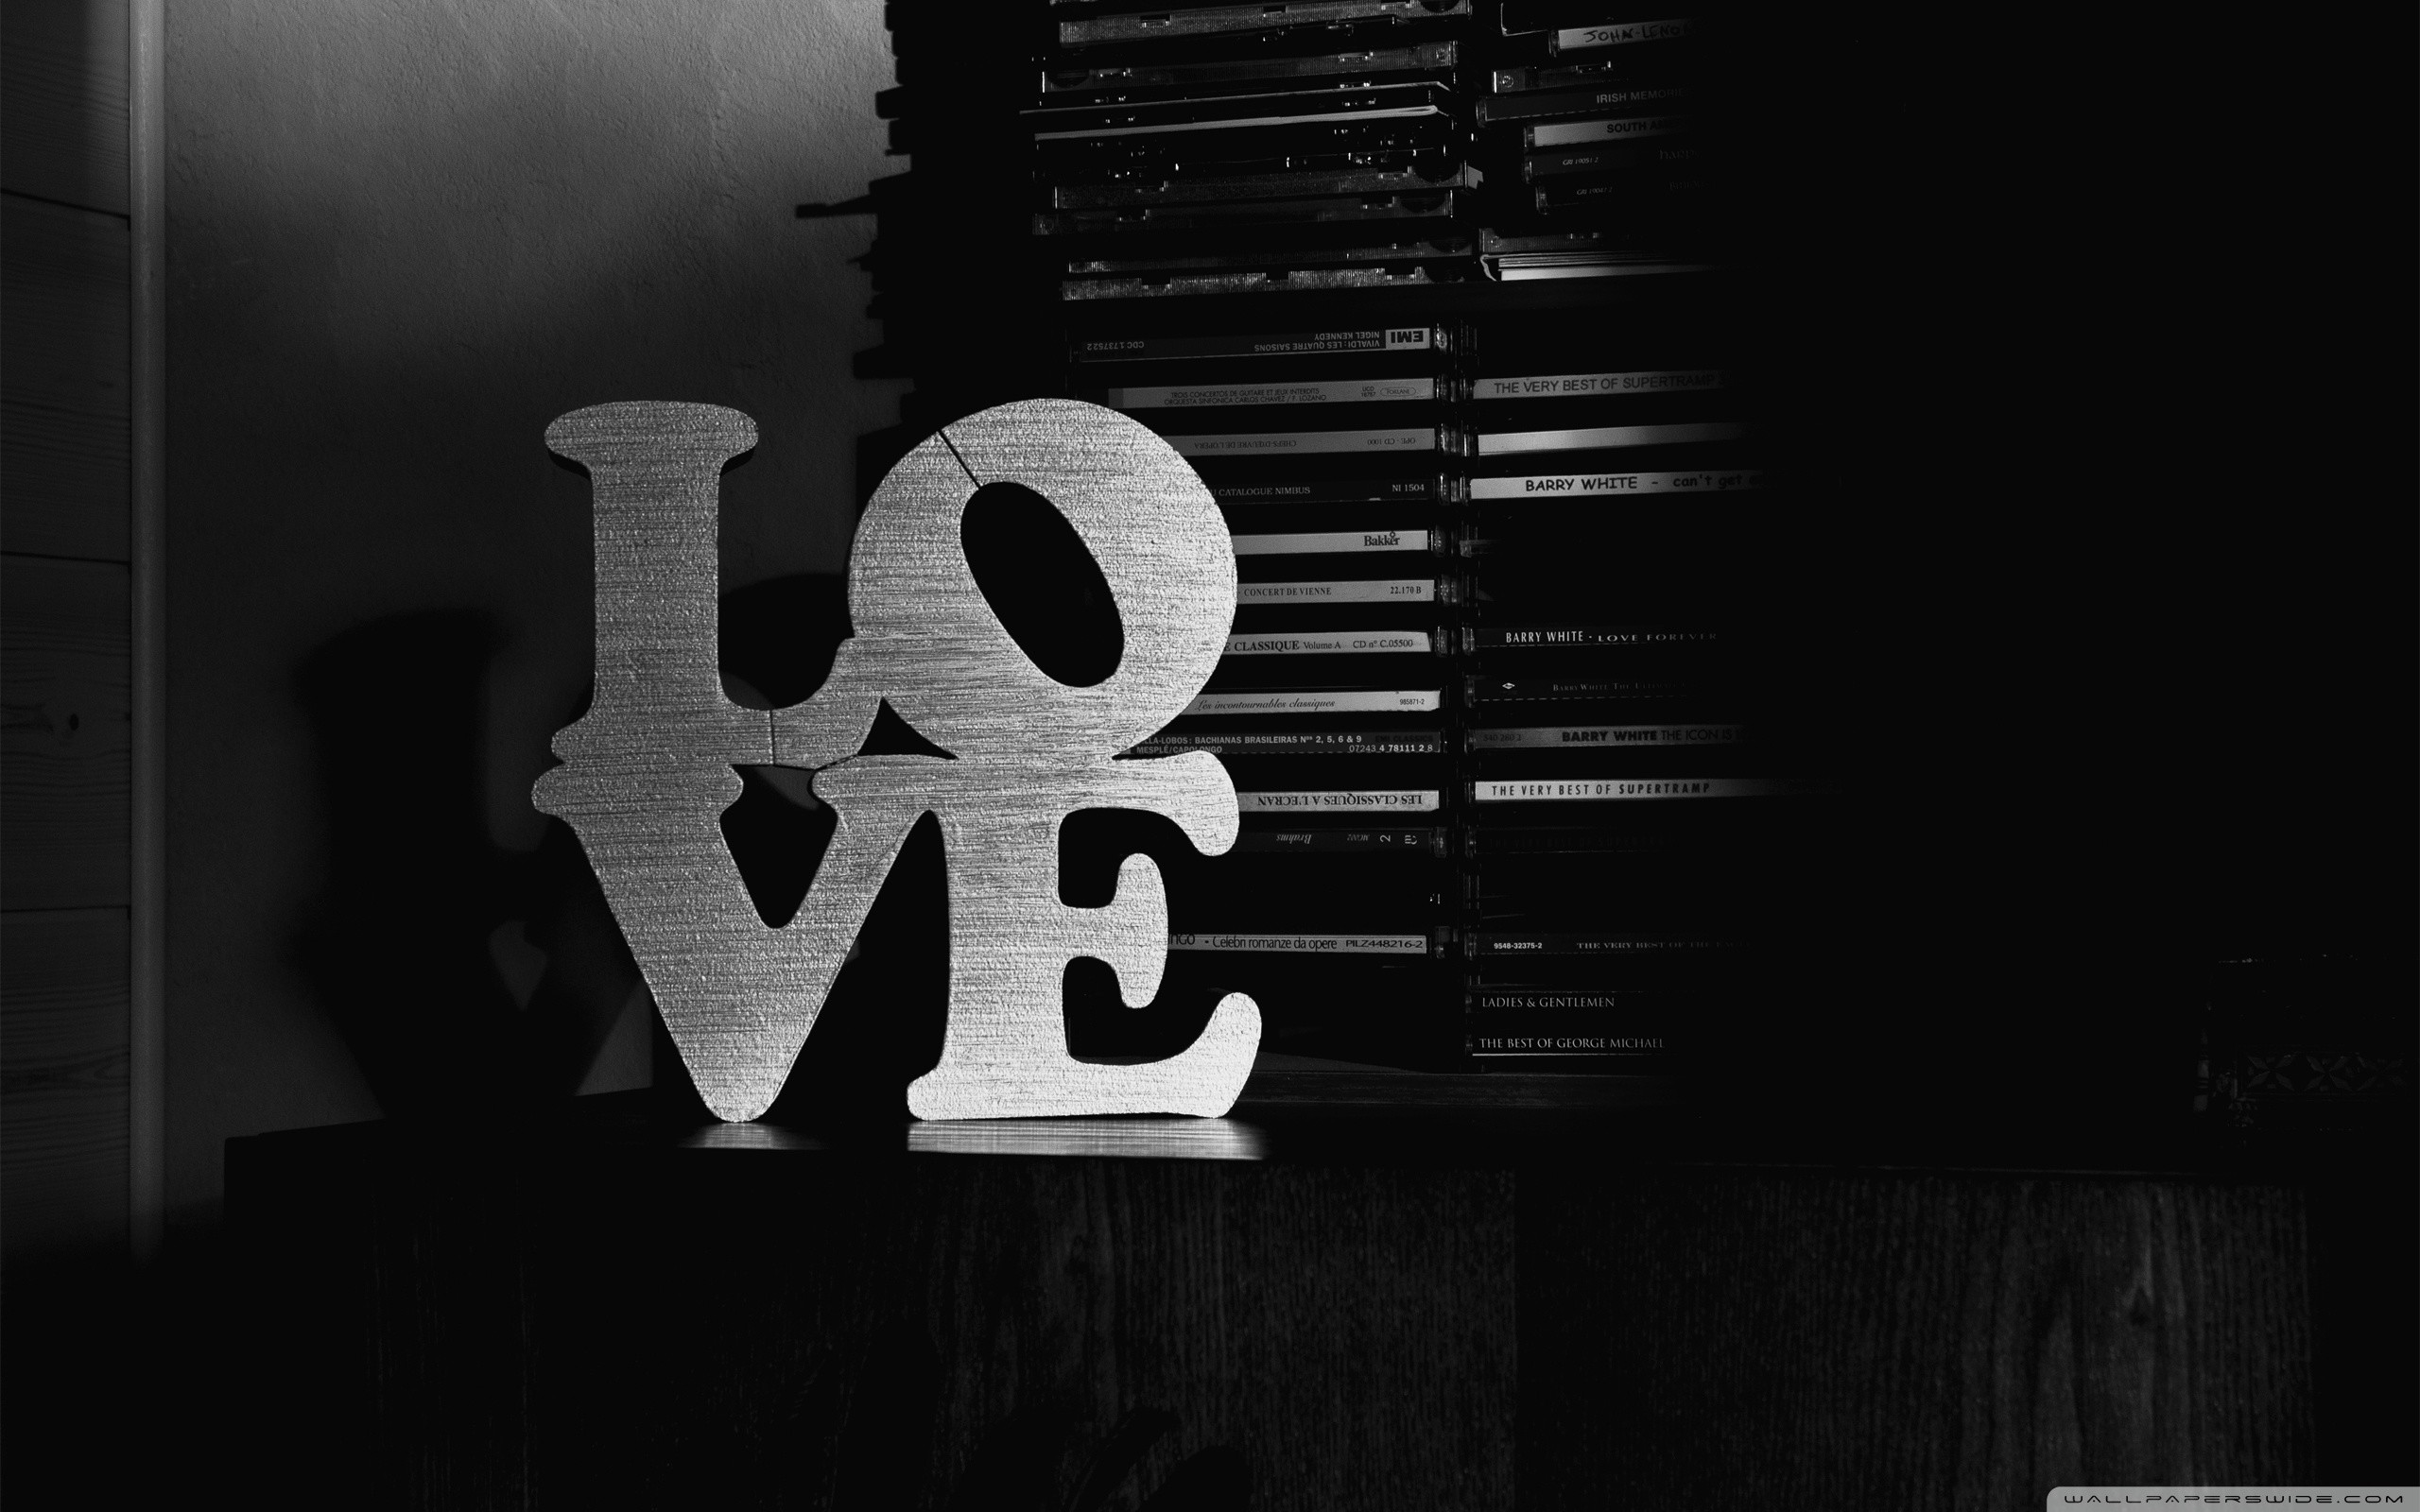 … love black and white hd desktop wallpaper high definition …